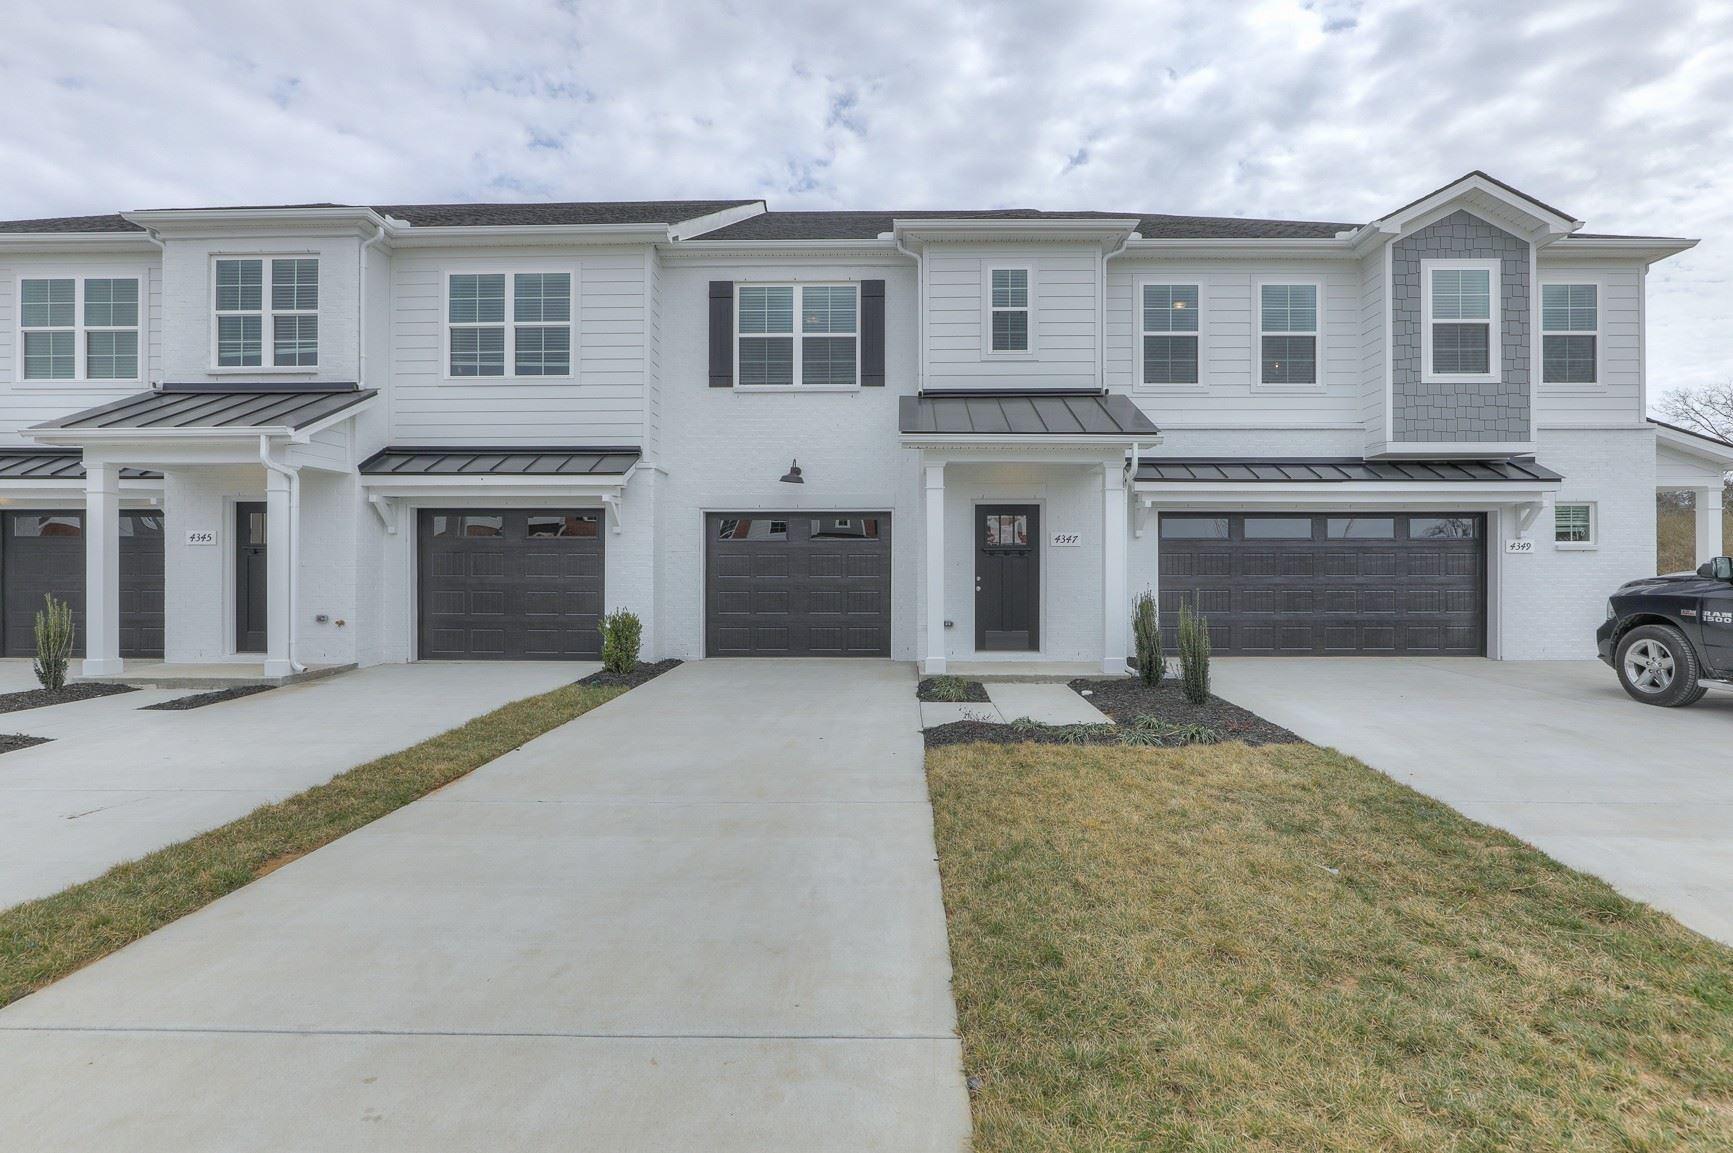 4221 Sarazen Lane, Murfreesboro, TN 37127 - MLS#: 2252083